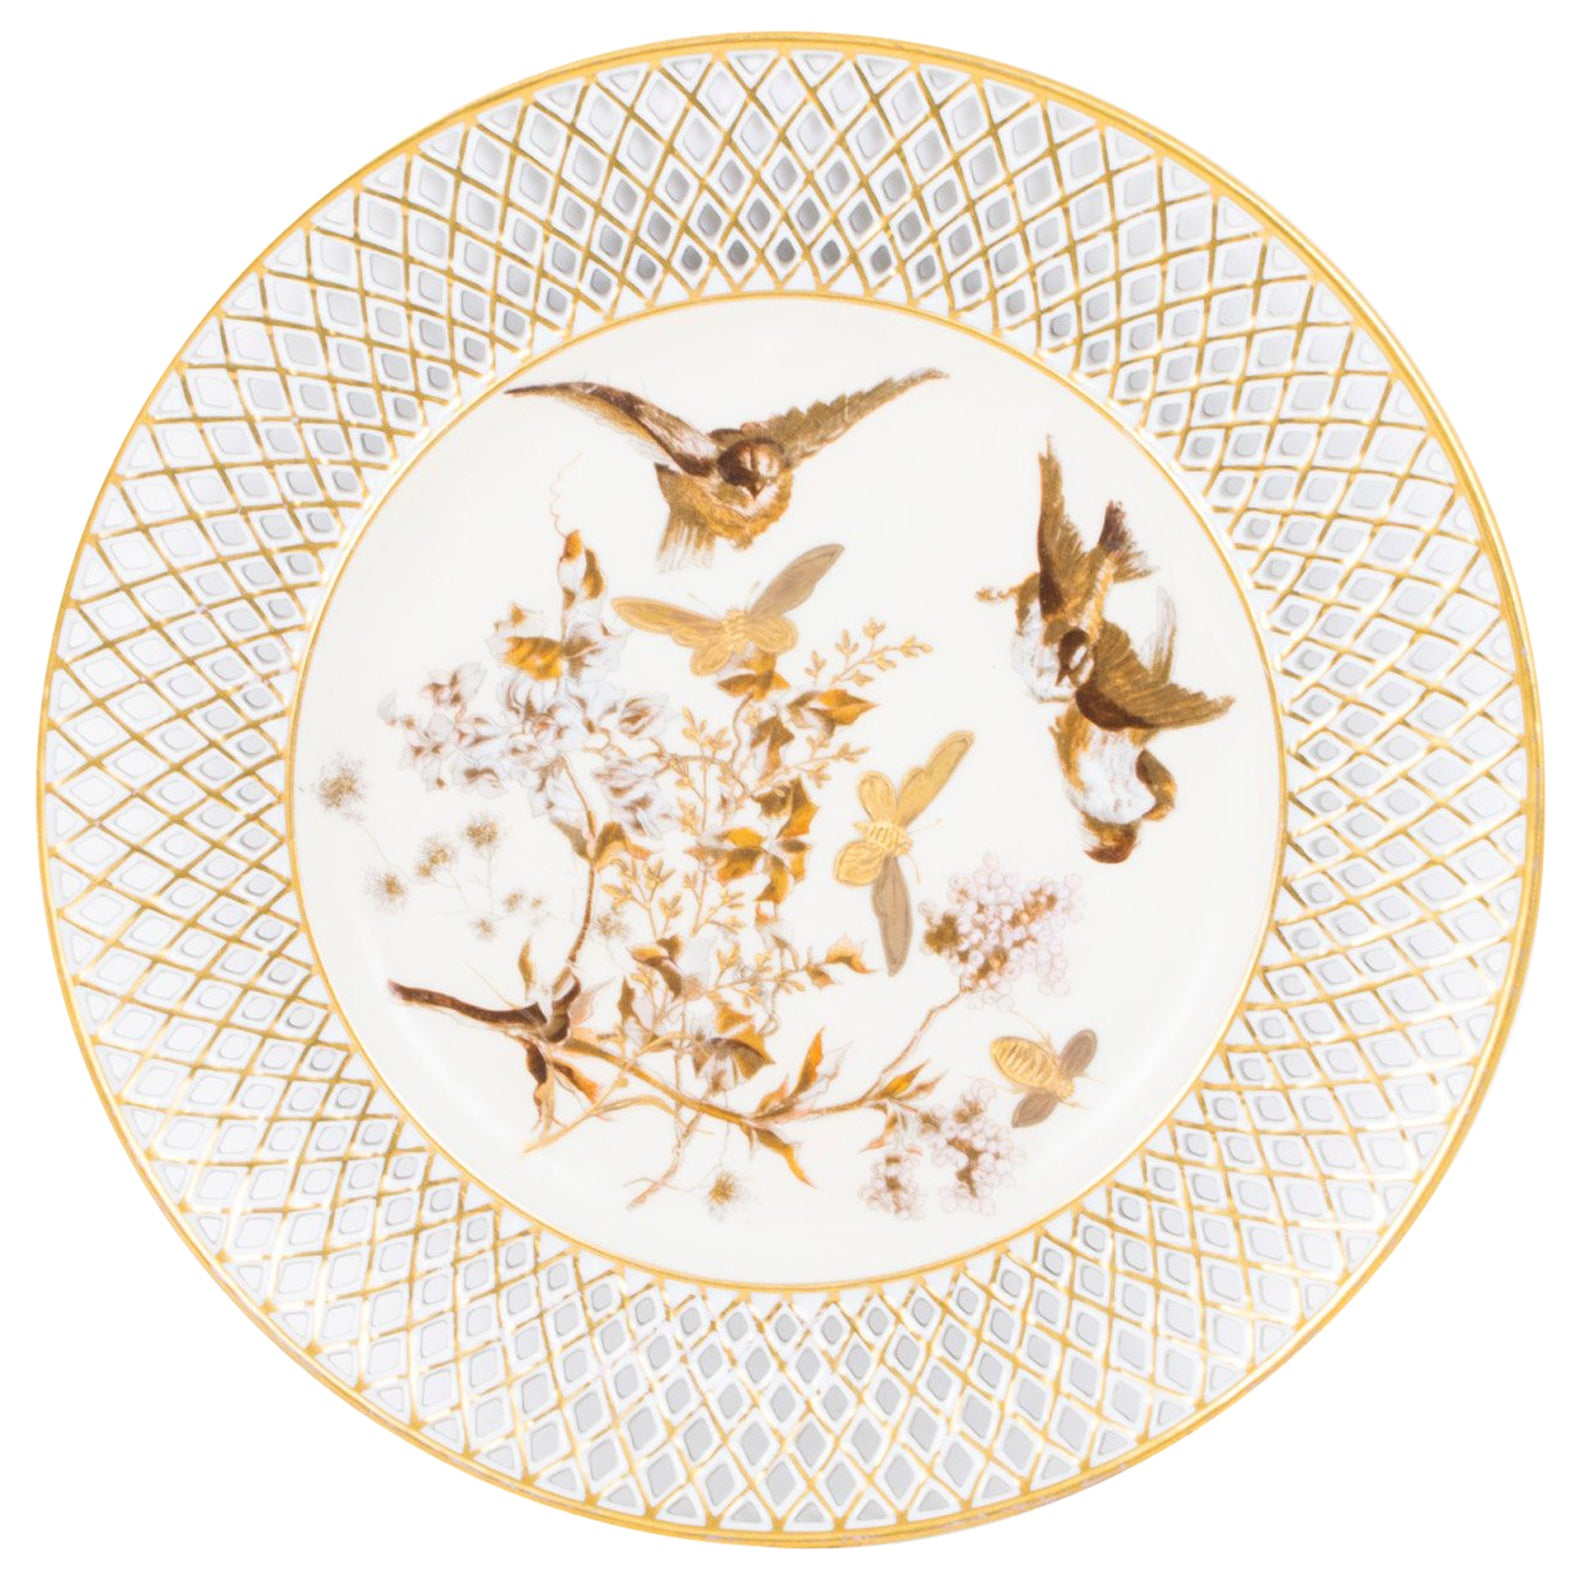 Early 20th Century Pirkenhammer Porcelain Cabinet Plate